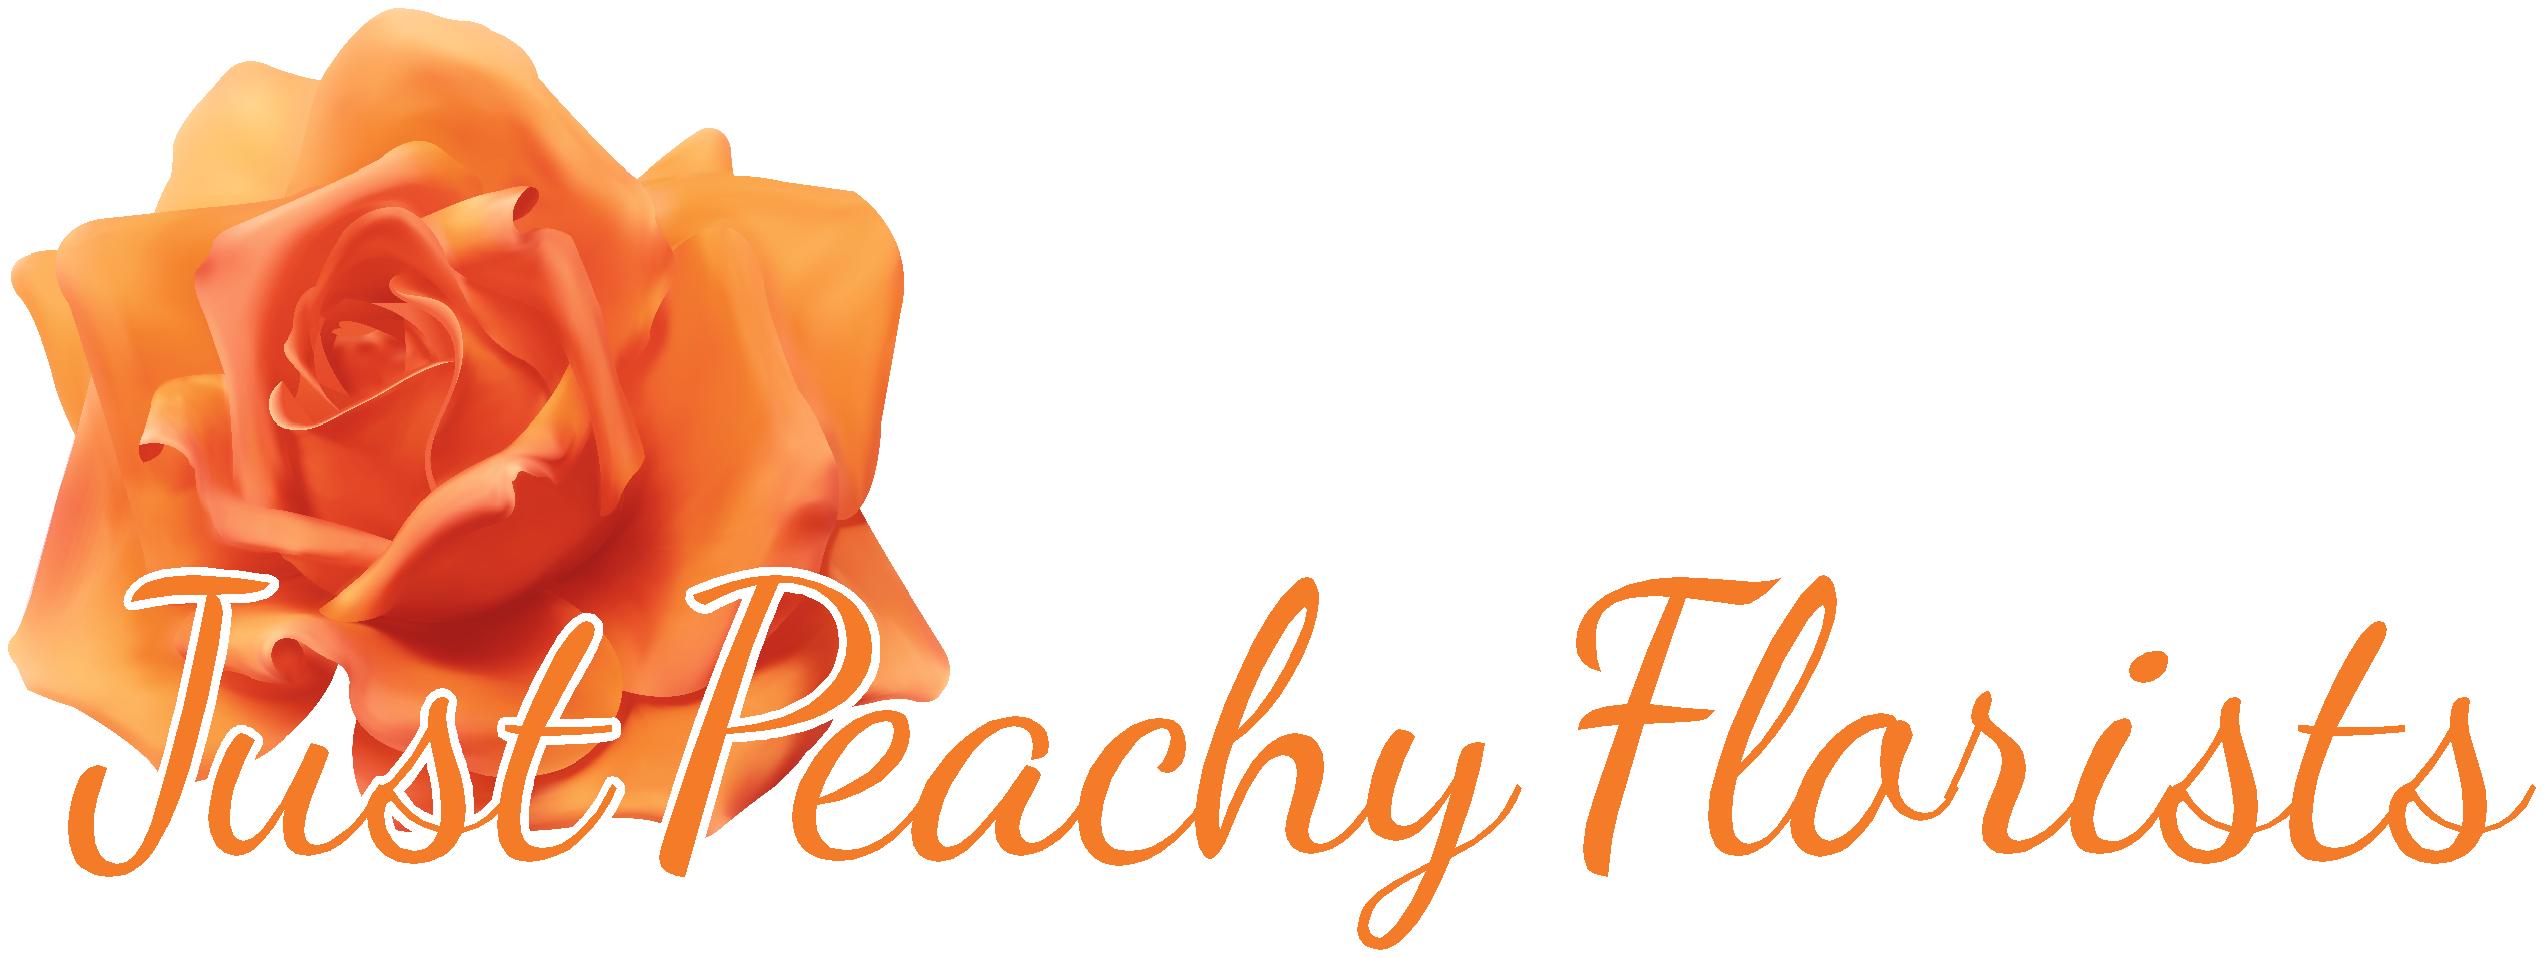 Just Peachy Florists